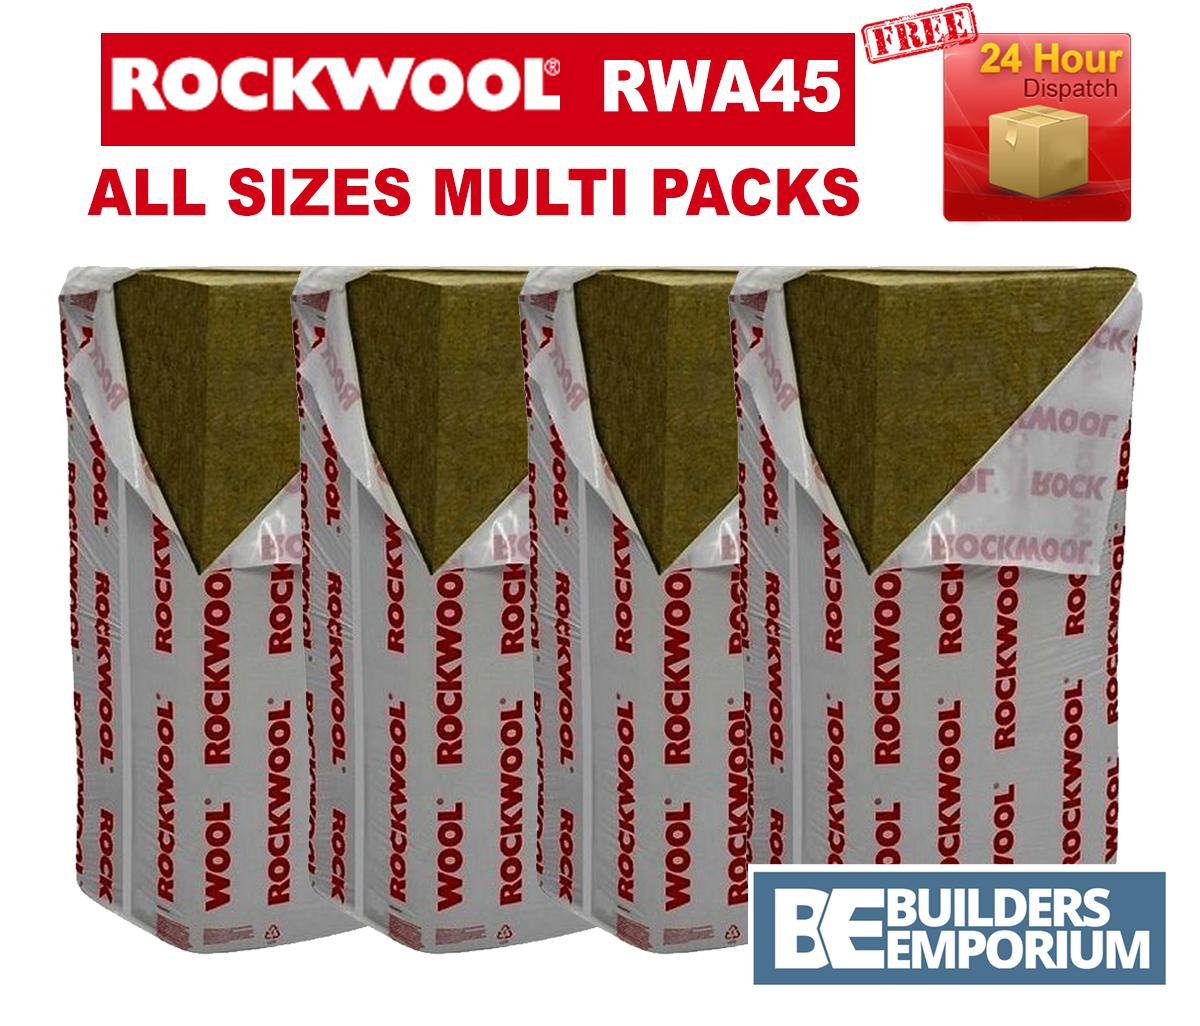 Rockwool Rwa45 Prorox Sl 920 Acoustic Sound Insulation